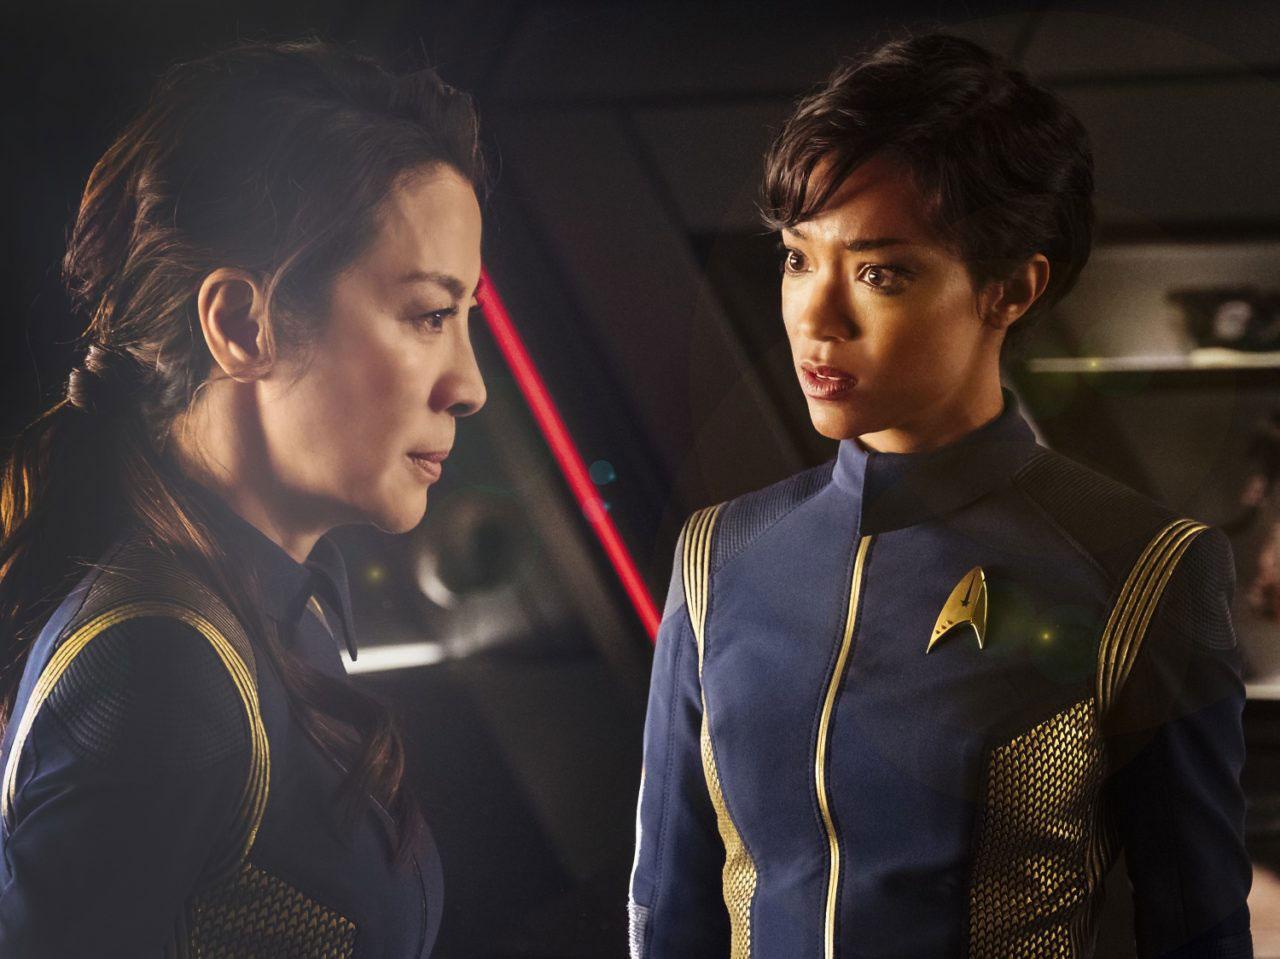 Michelle Yeoh as Captain Philippa Georgiou and  Sonequa Martin-Green as First Officer Michael Burnham